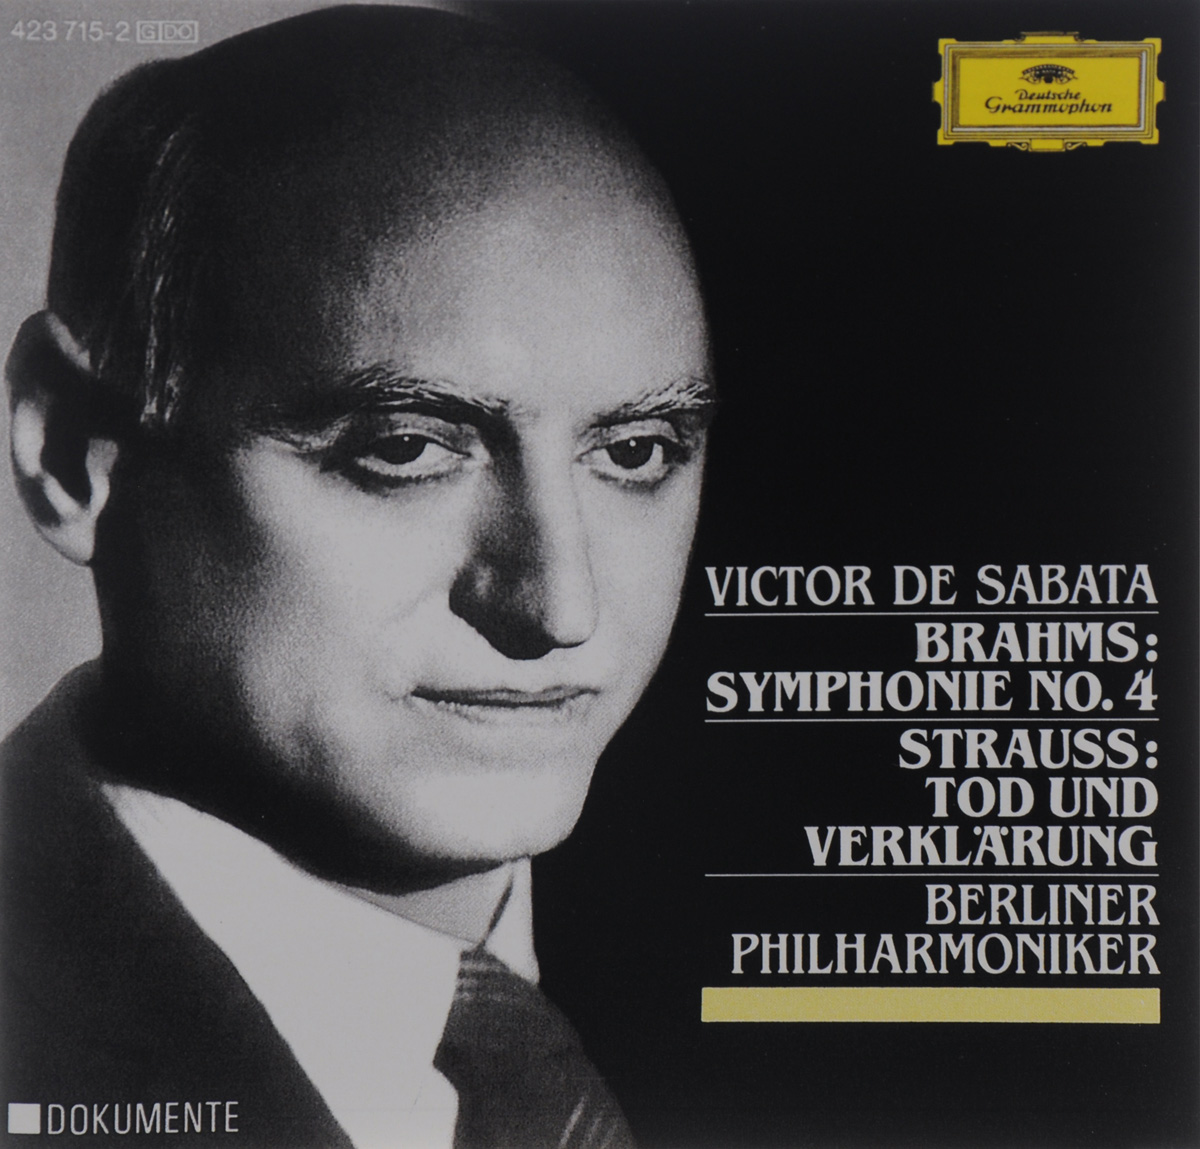 Victor De Sabata Brahms. Symphony No. 4 / Strauss. Tod Und Verklarung brahms brahms symphony no 4